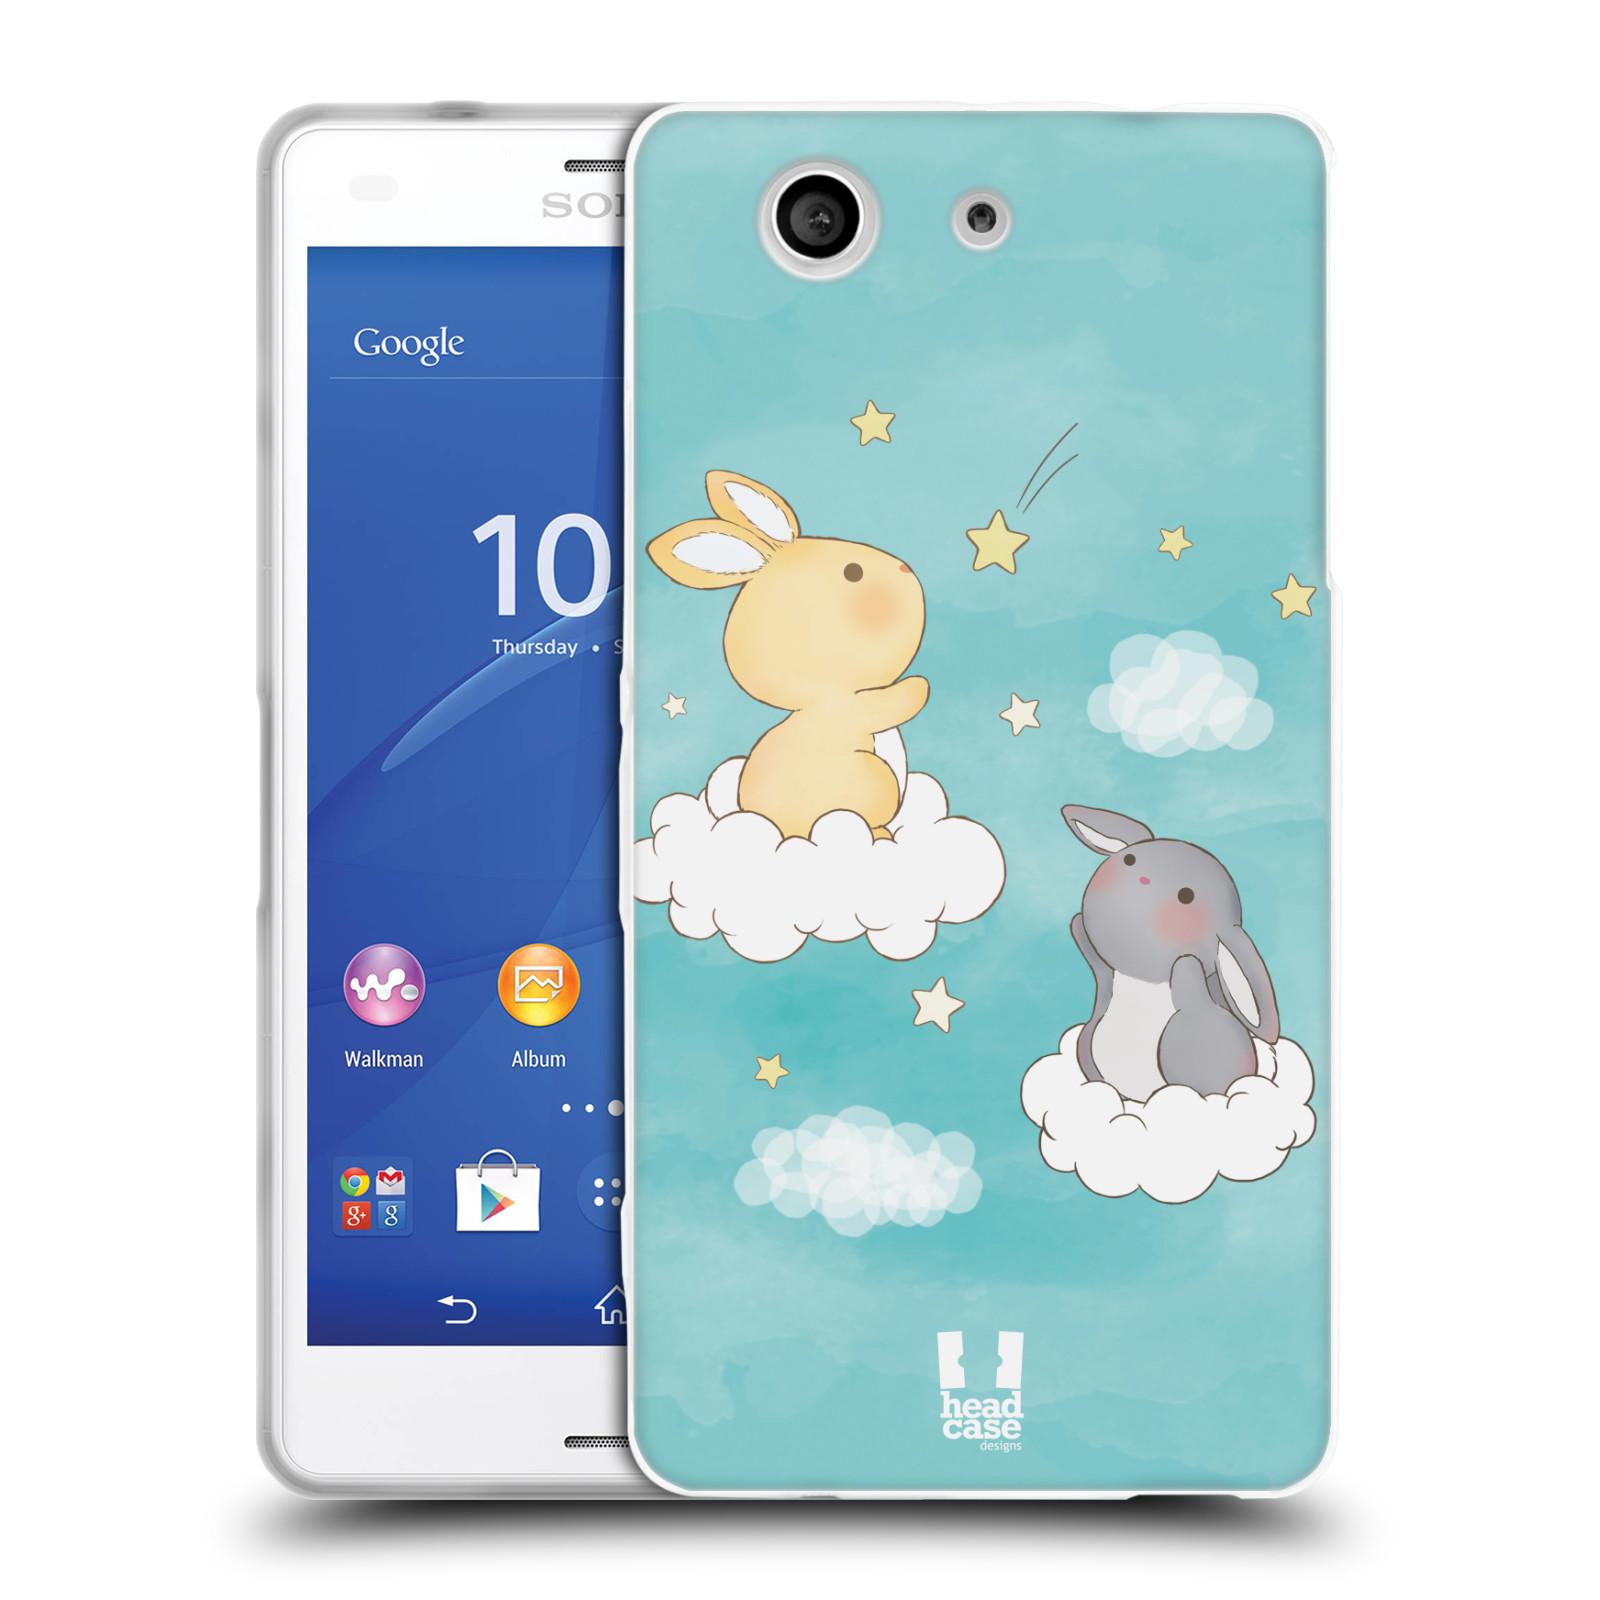 HEAD CASE silikonový obal na mobil Sony Xperia Z3 COMPACT (D5803) vzor králíček a hvězdy modrá